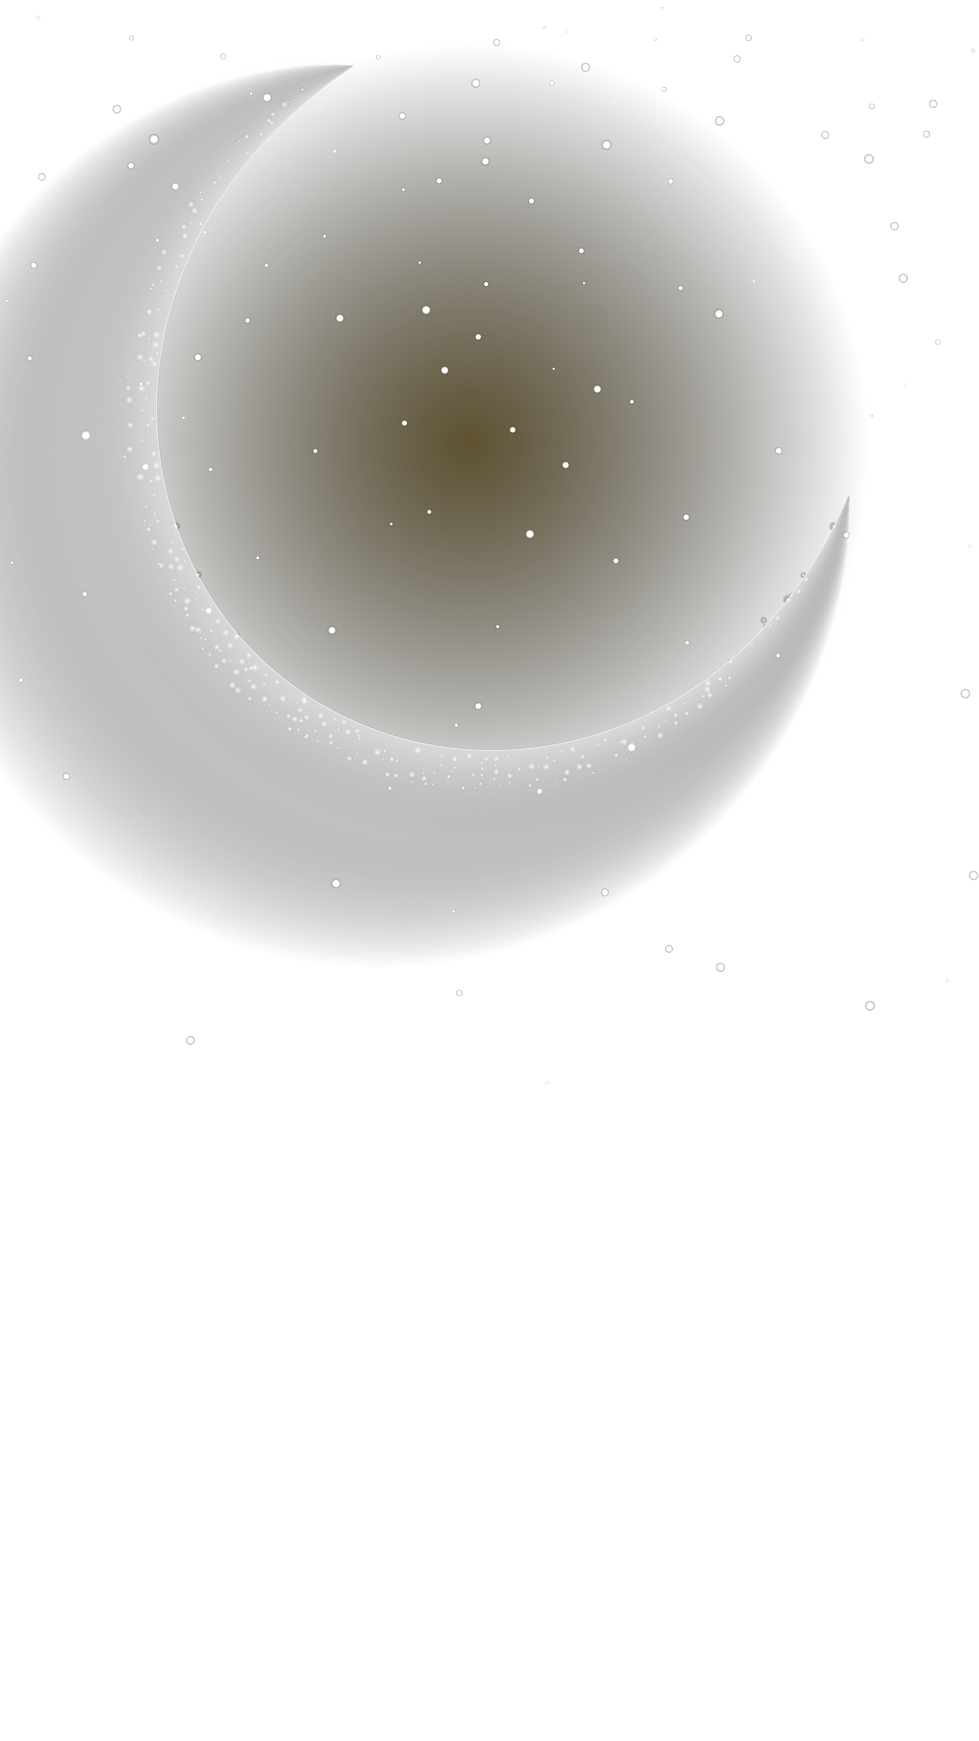 bulan-01.png